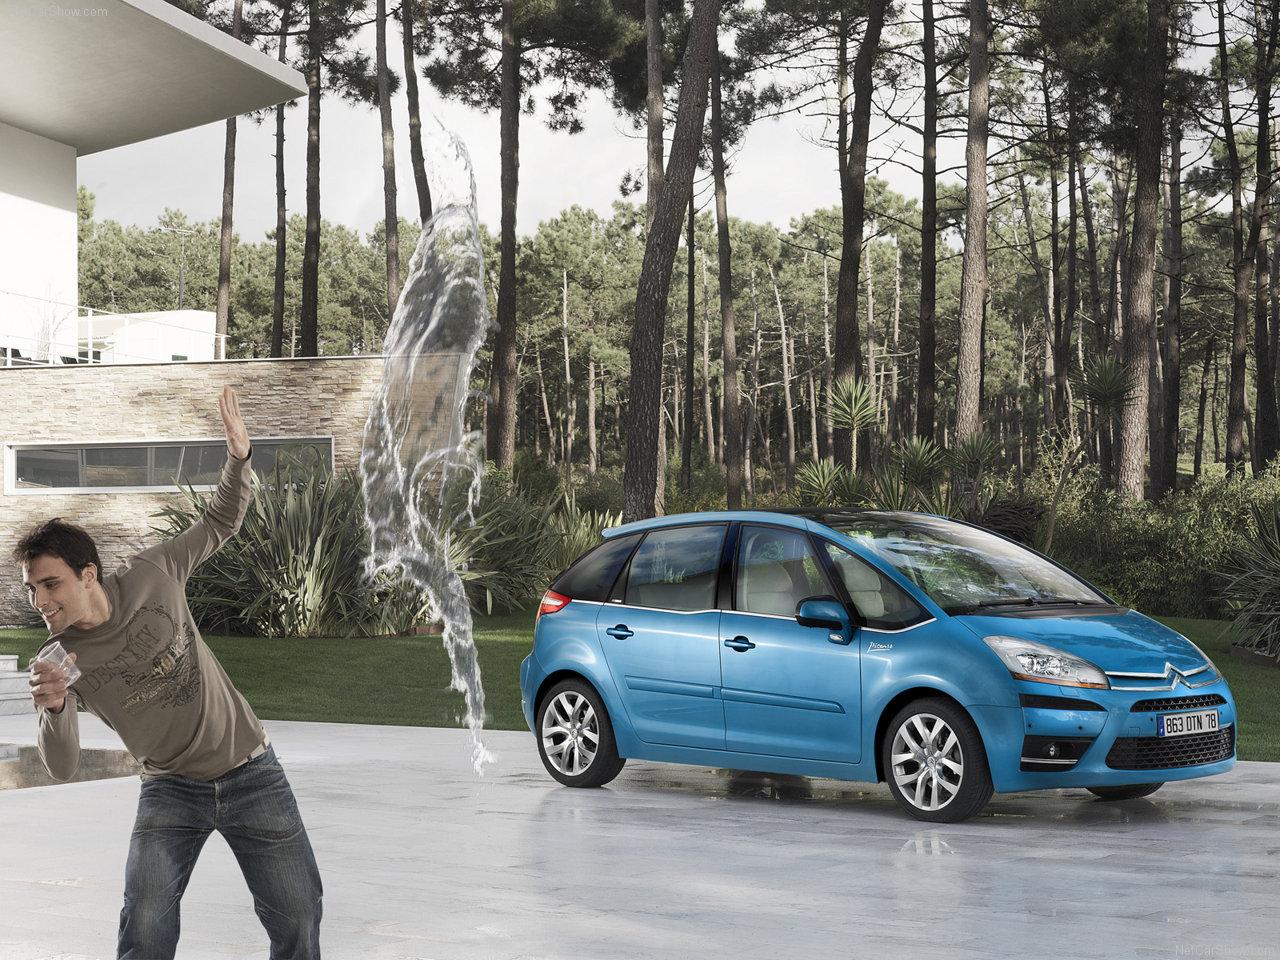 Citroen C4 Picasso, Citroen C4, Citroen Picasso, C4 Picasso, C4, MPV, family car, french car, safe car, cheap car, car sales, motoring, automotive, ebay motors, autotrader